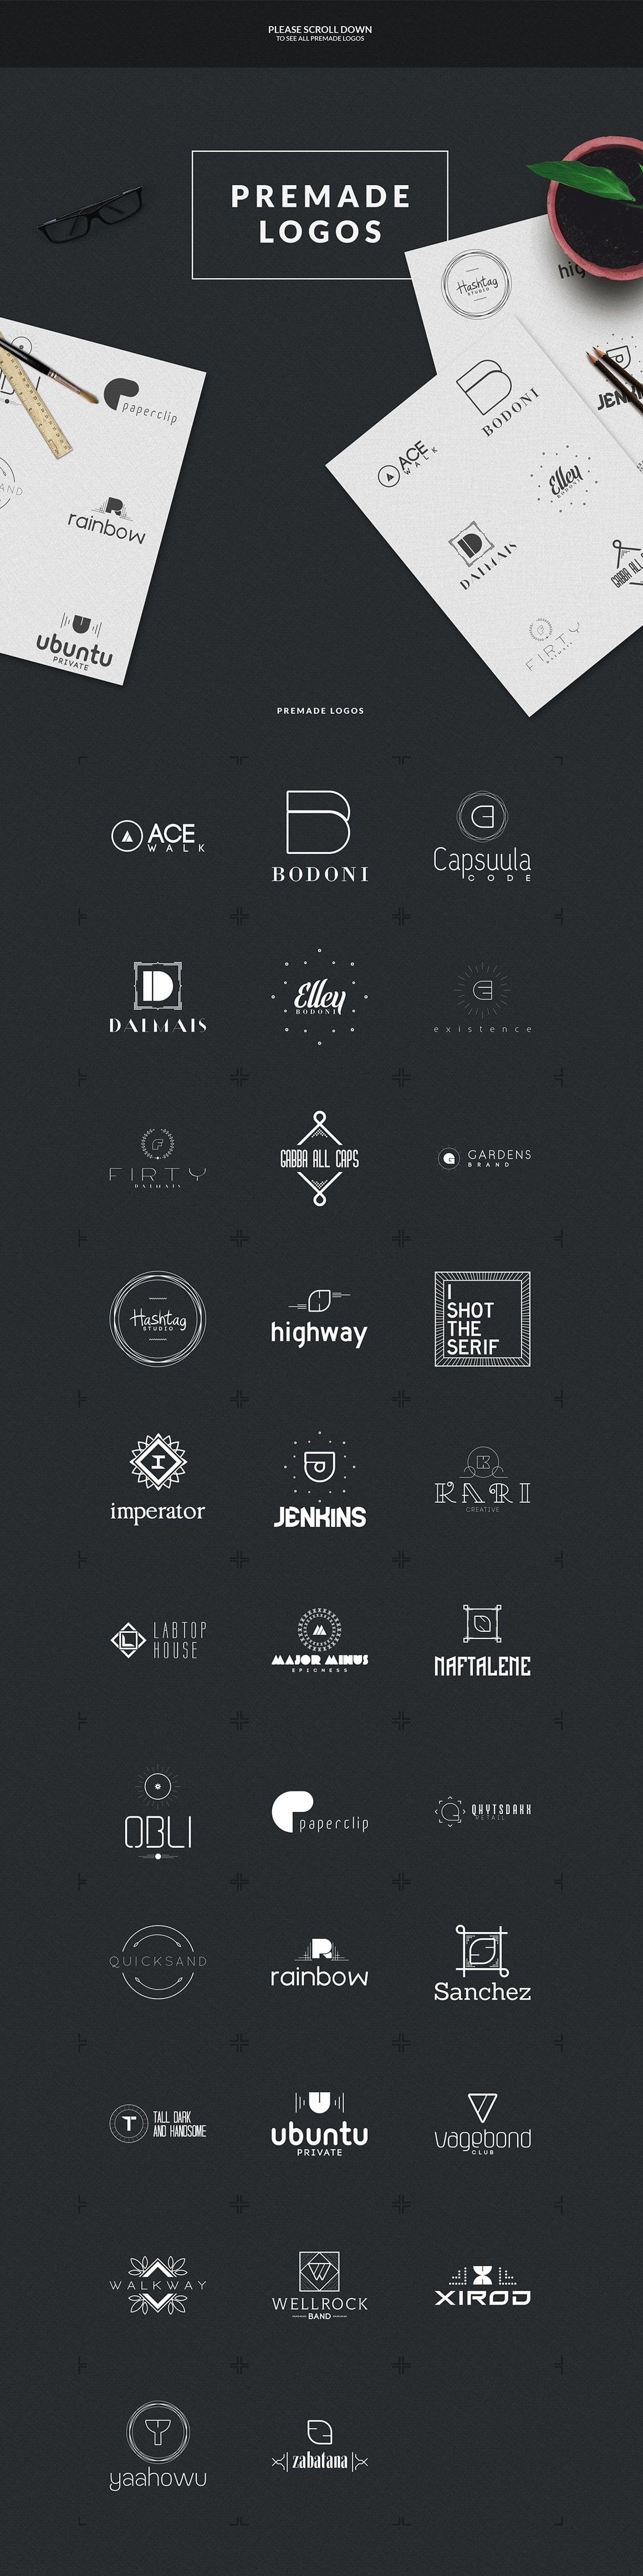 Logo Creation Kit: 409 Elements - just $5 - 3